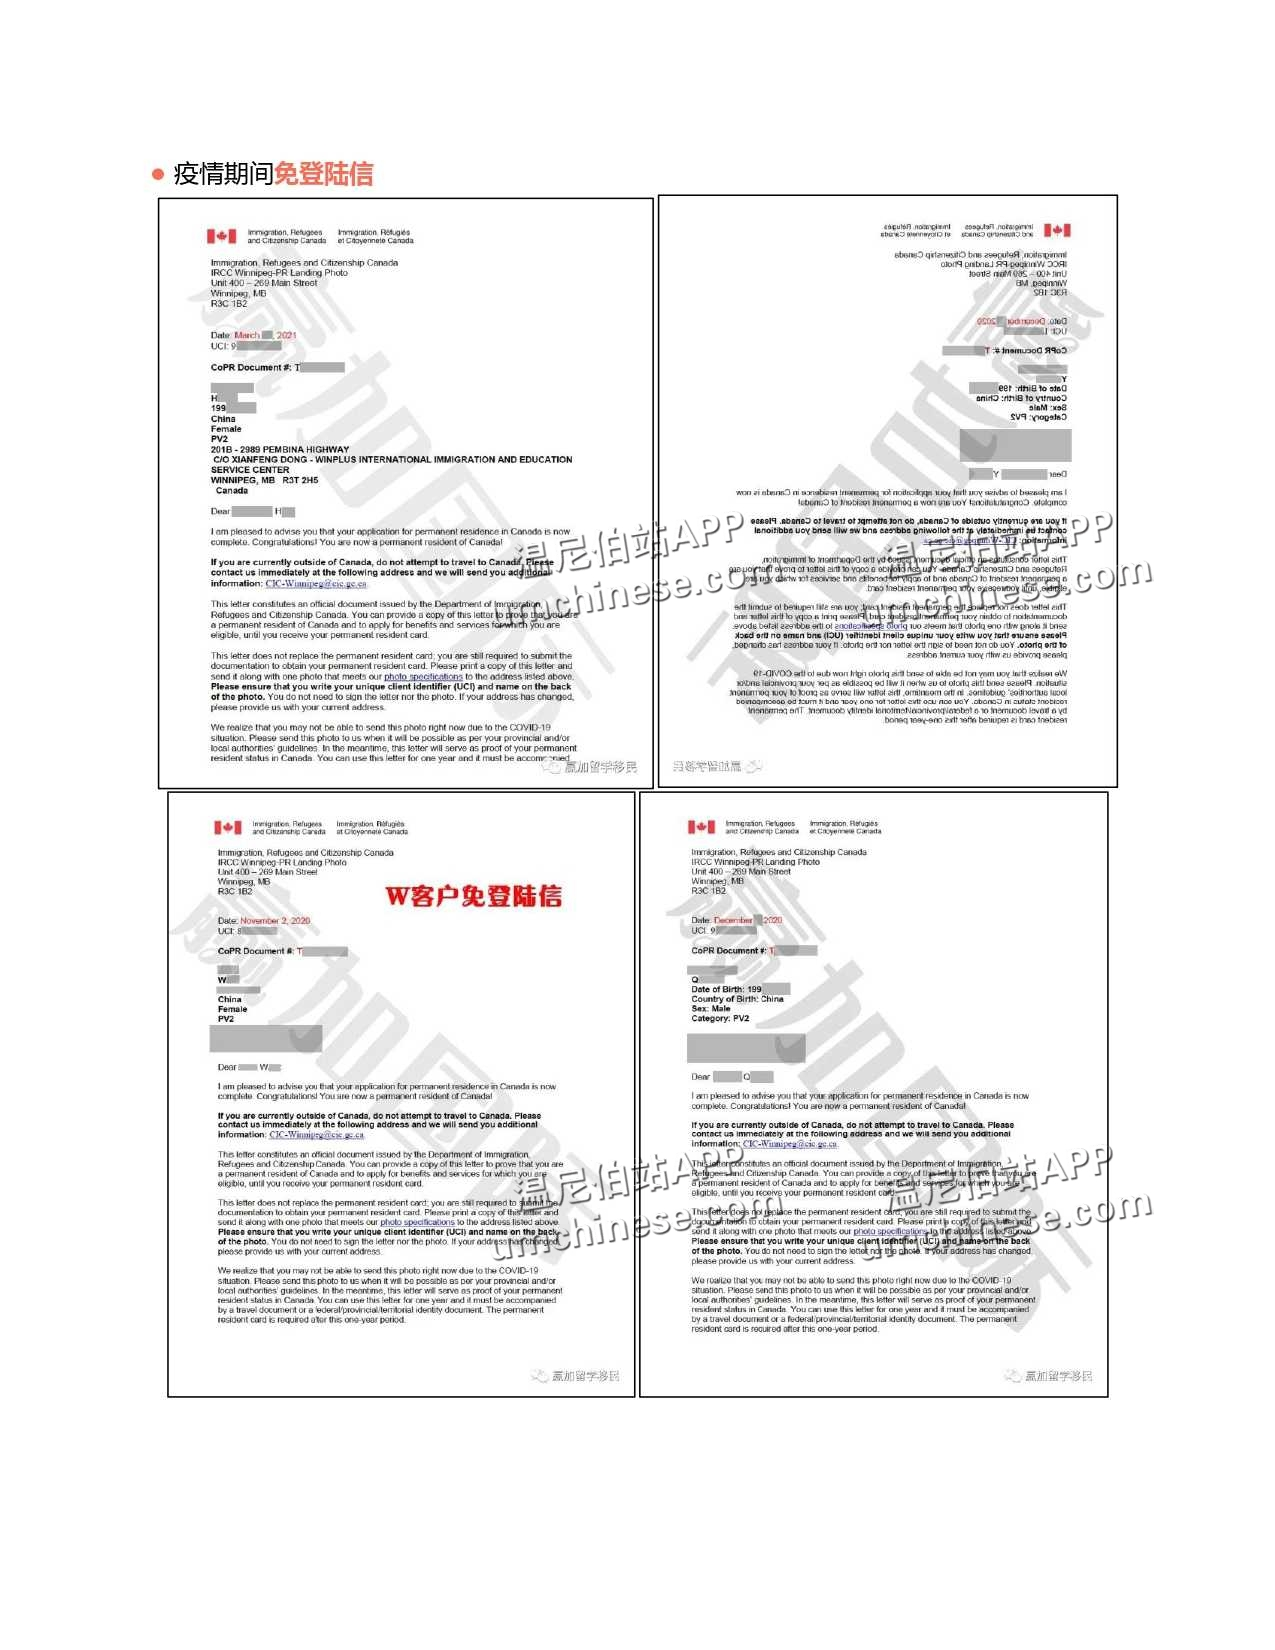 香港政策_page-0007.jpg